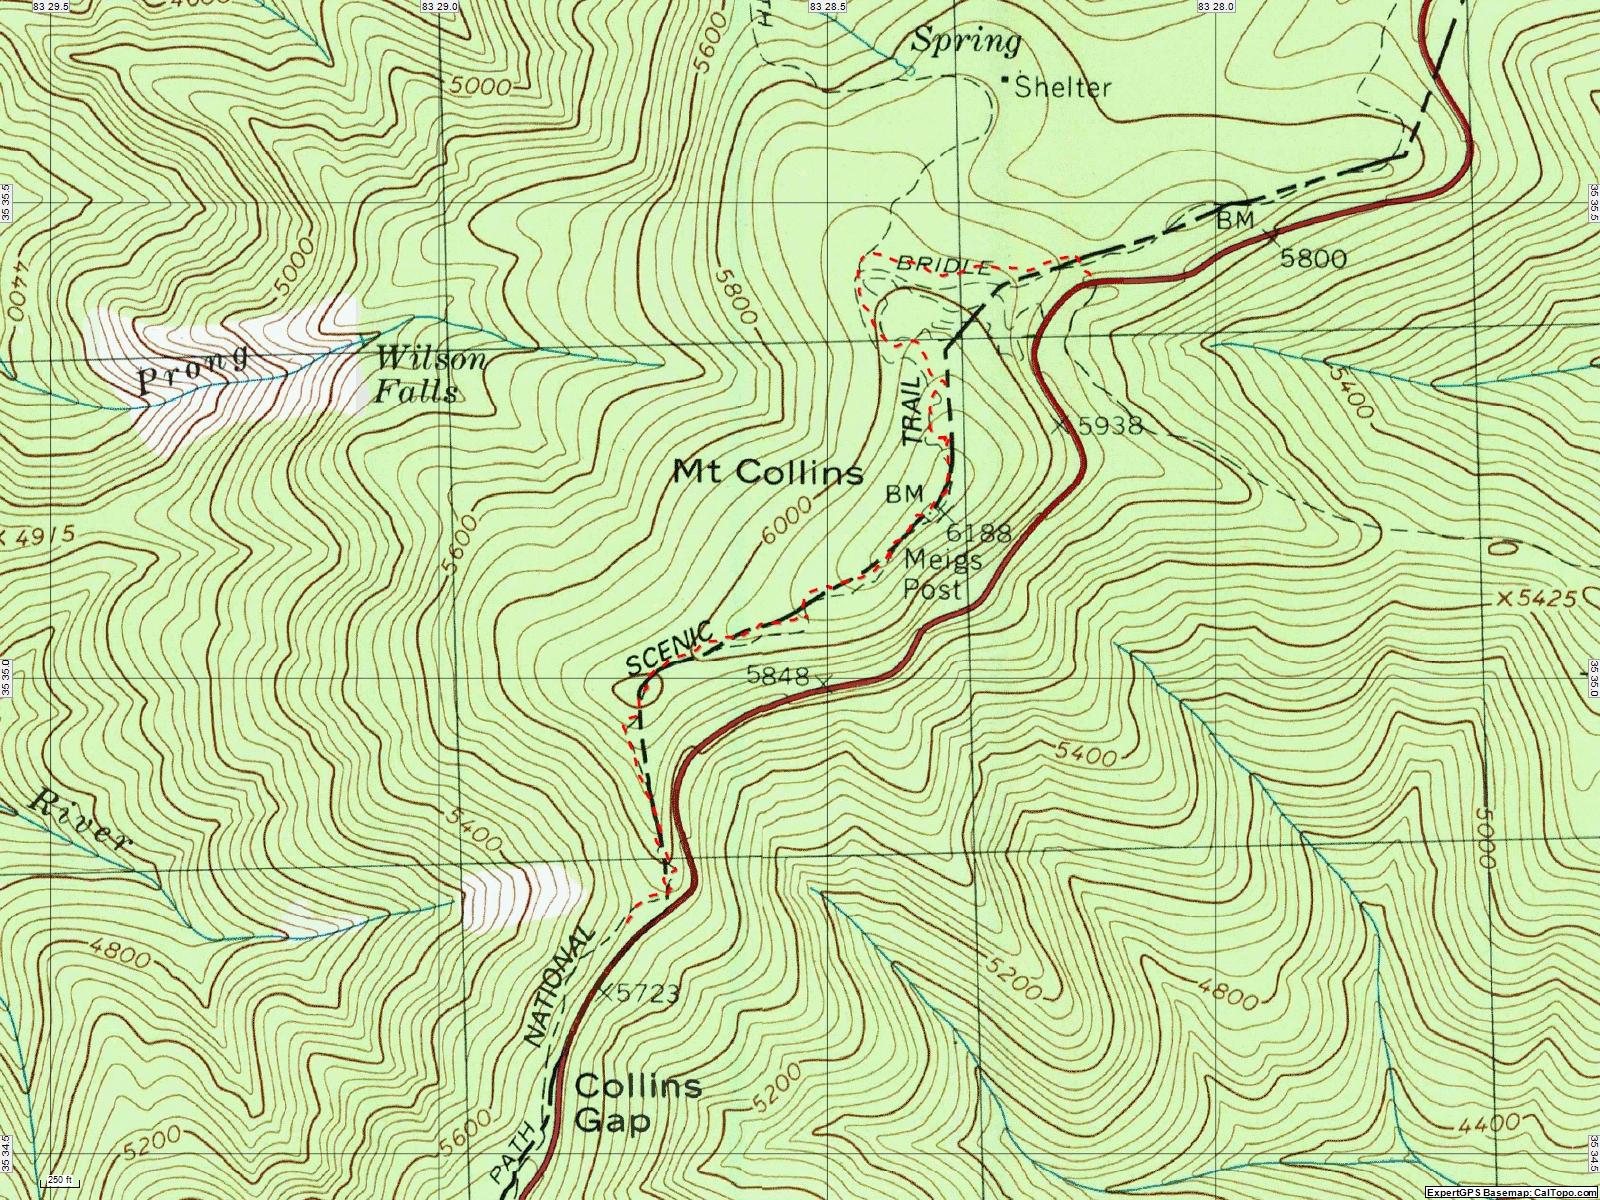 American Travel Journal Collins Gap To Fork Ridge Trail - Appalachian trail topo map